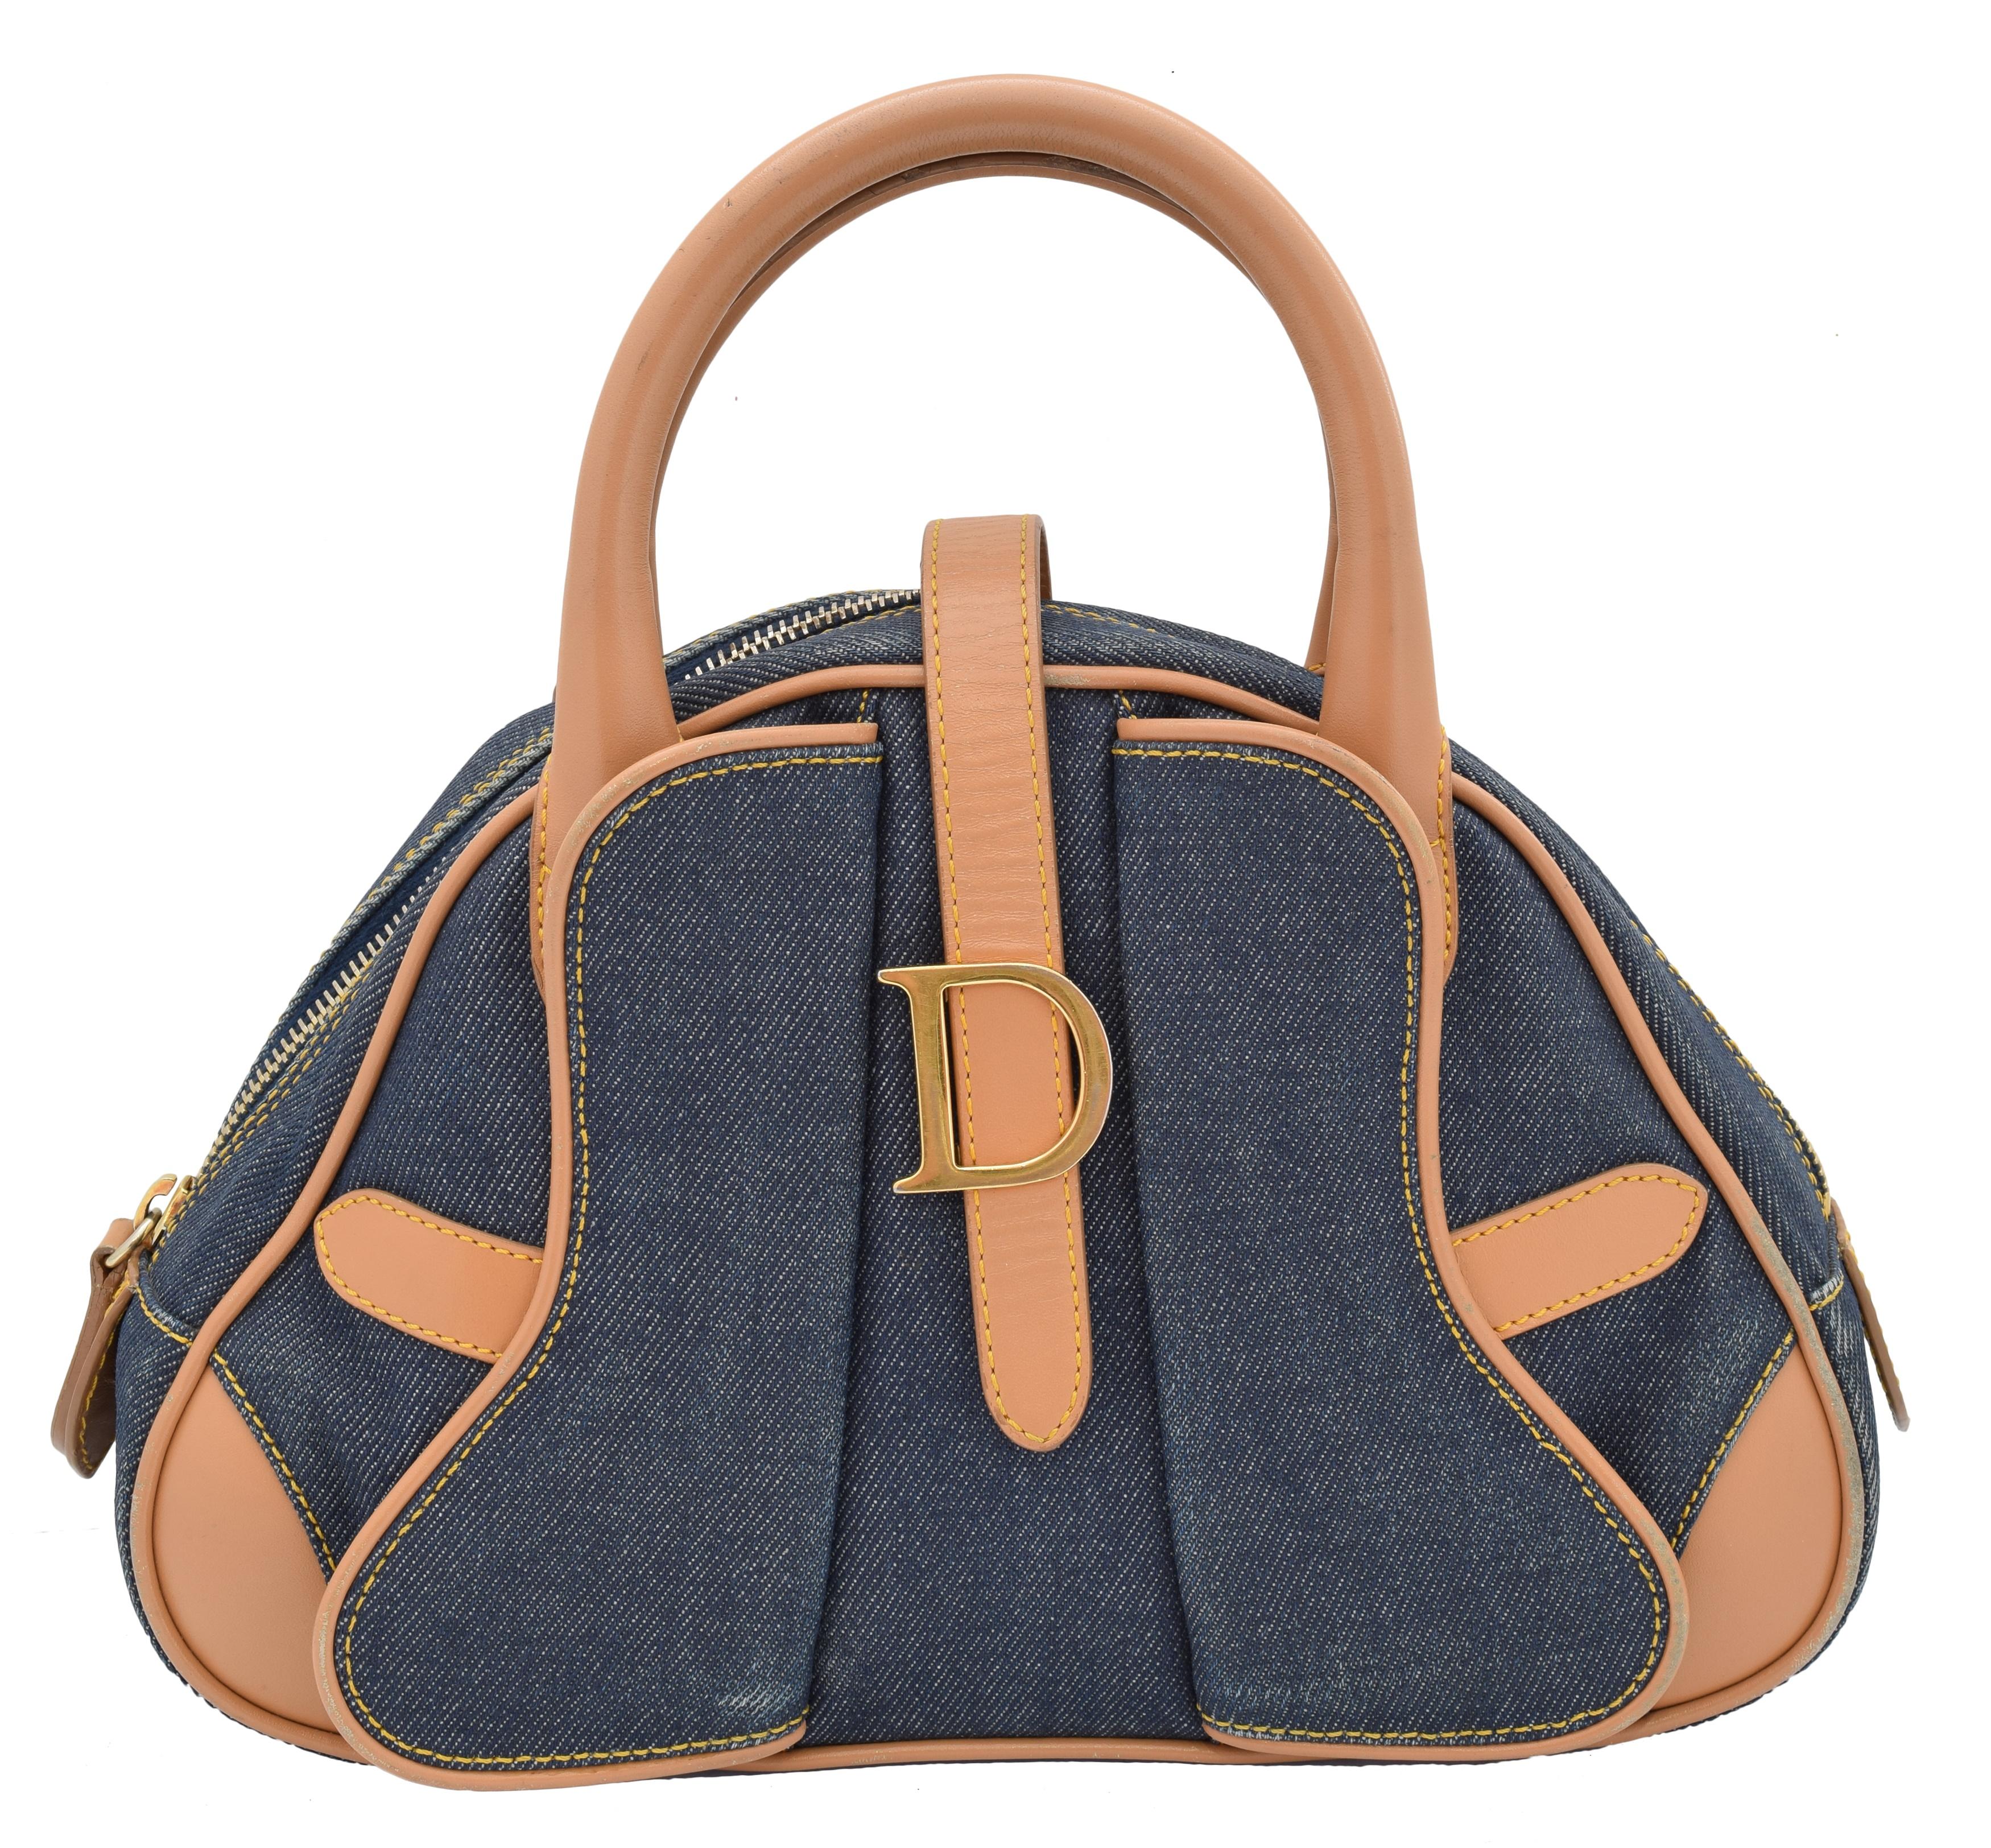 A Dior Double Saddle bag,